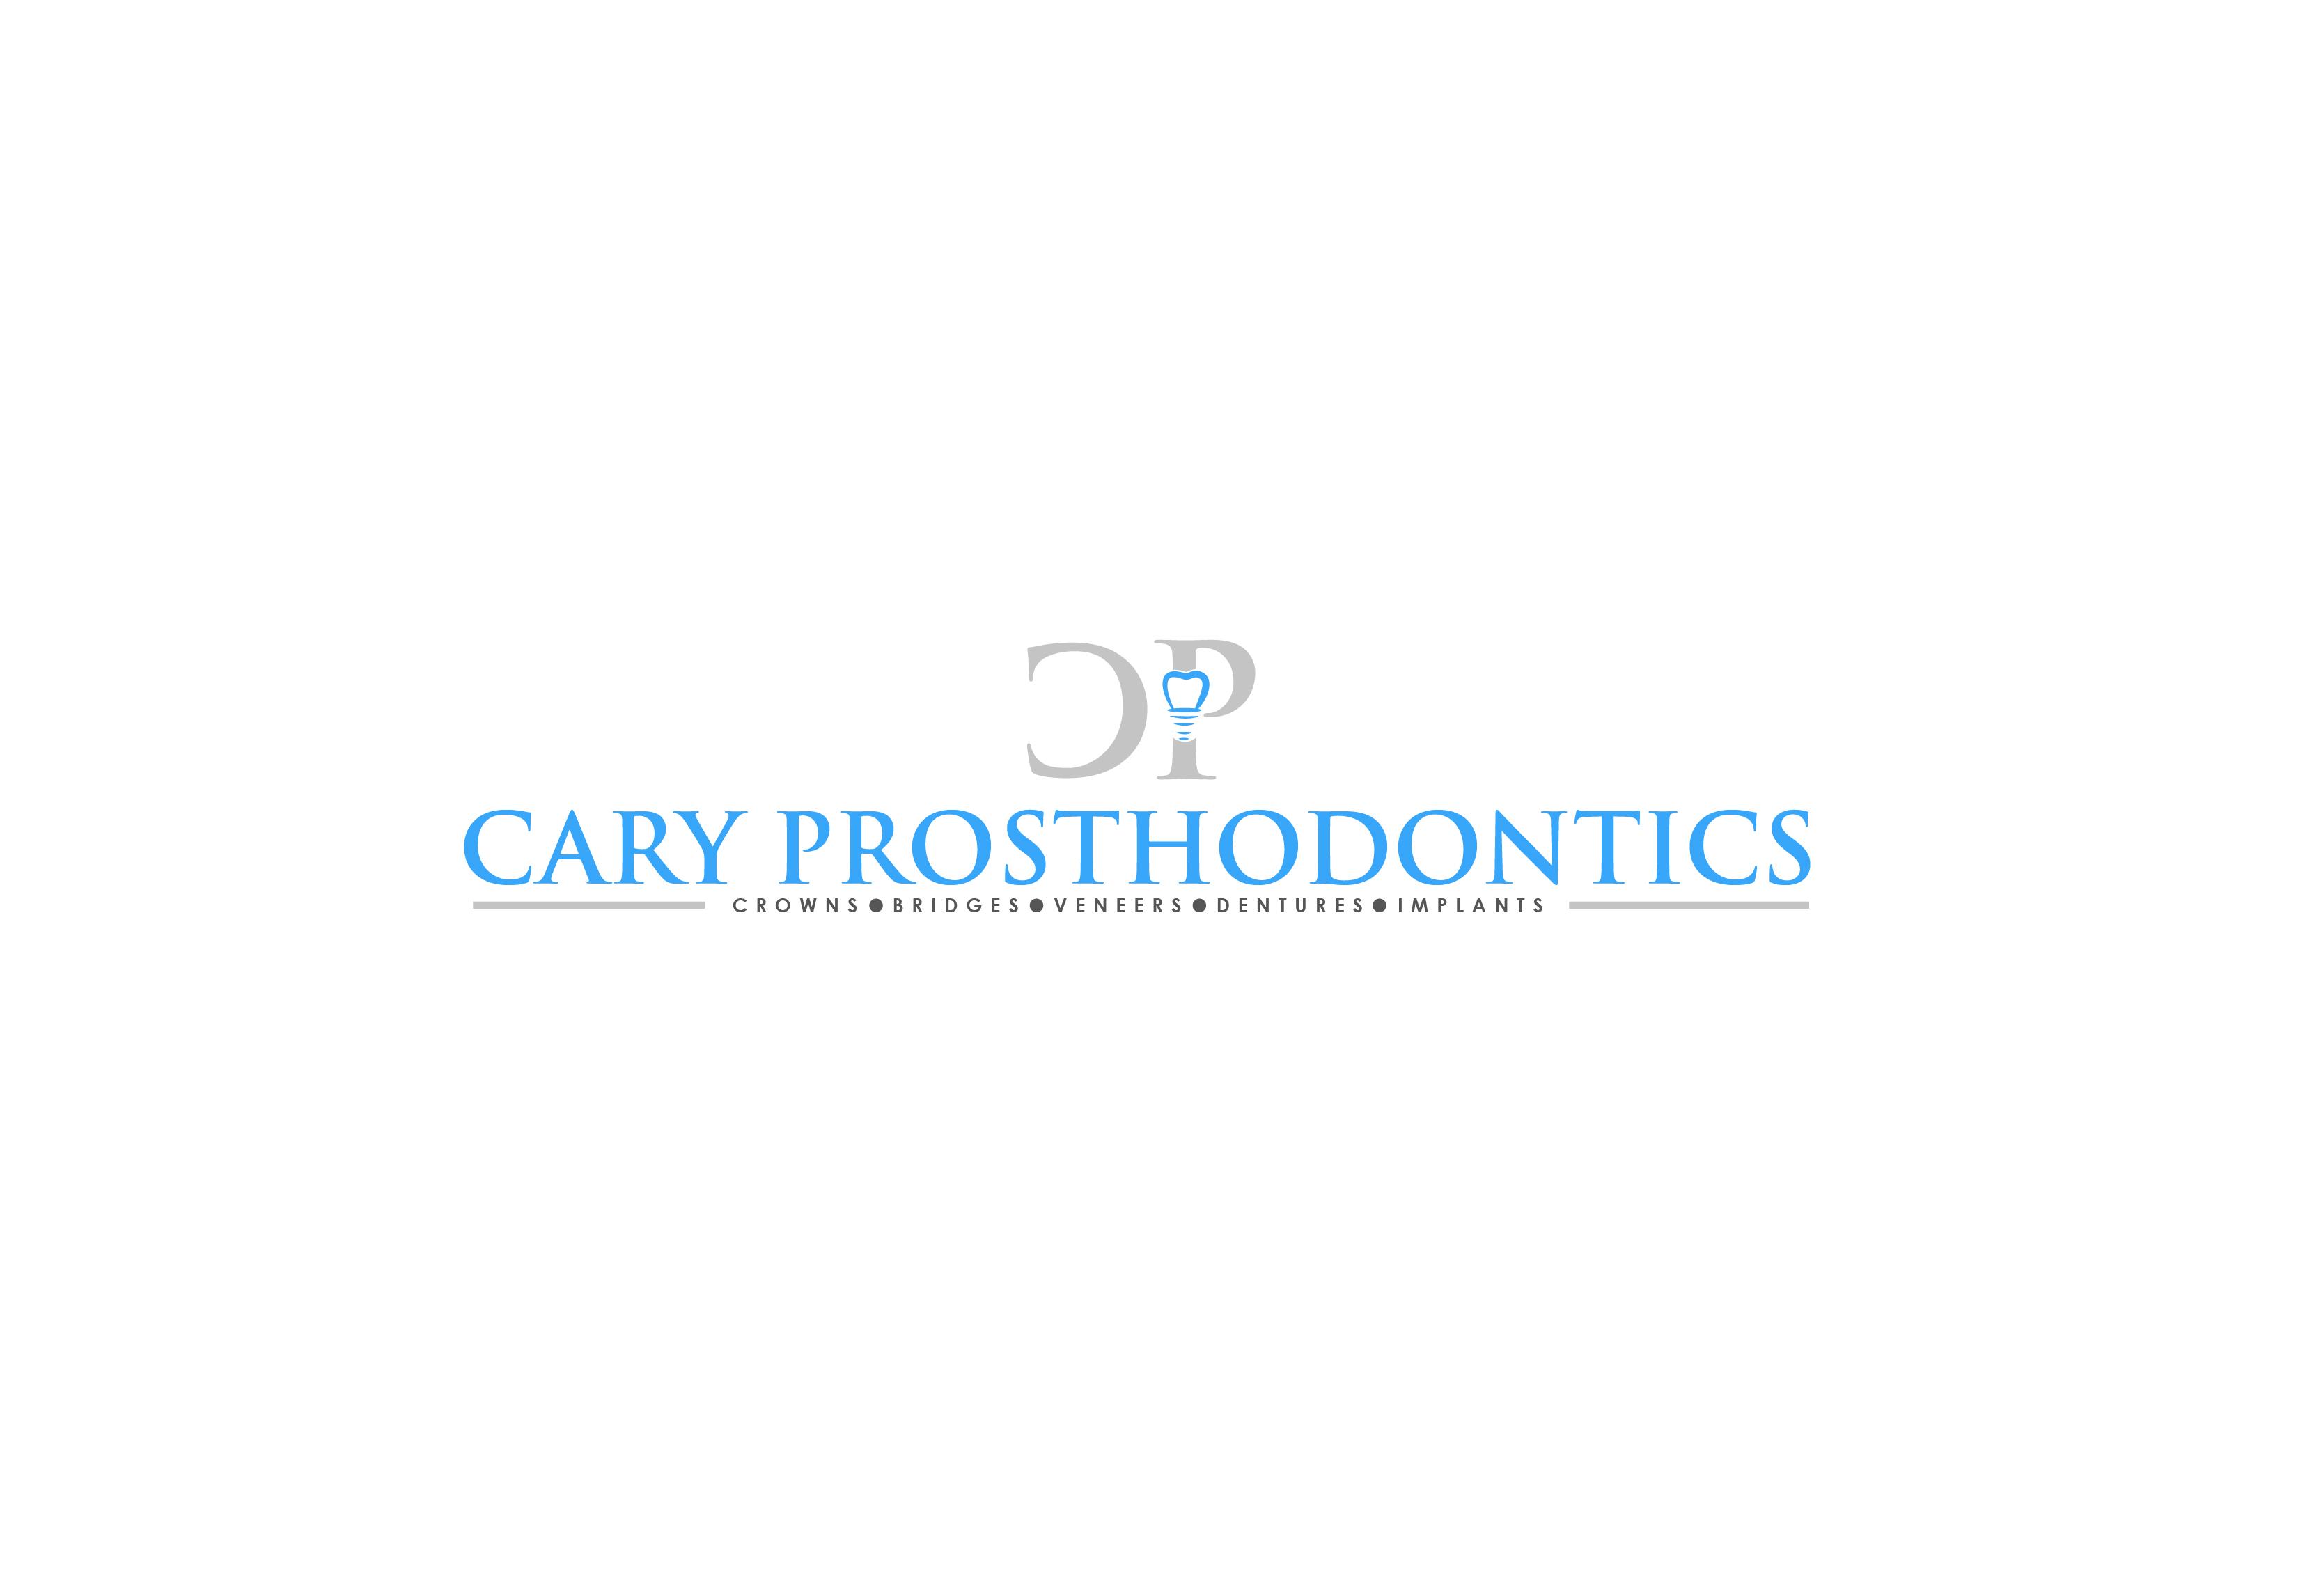 Logo Design by Cyril bail Geronimo - Entry No. 93 in the Logo Design Contest Cary Prosthodontics Logo Design.